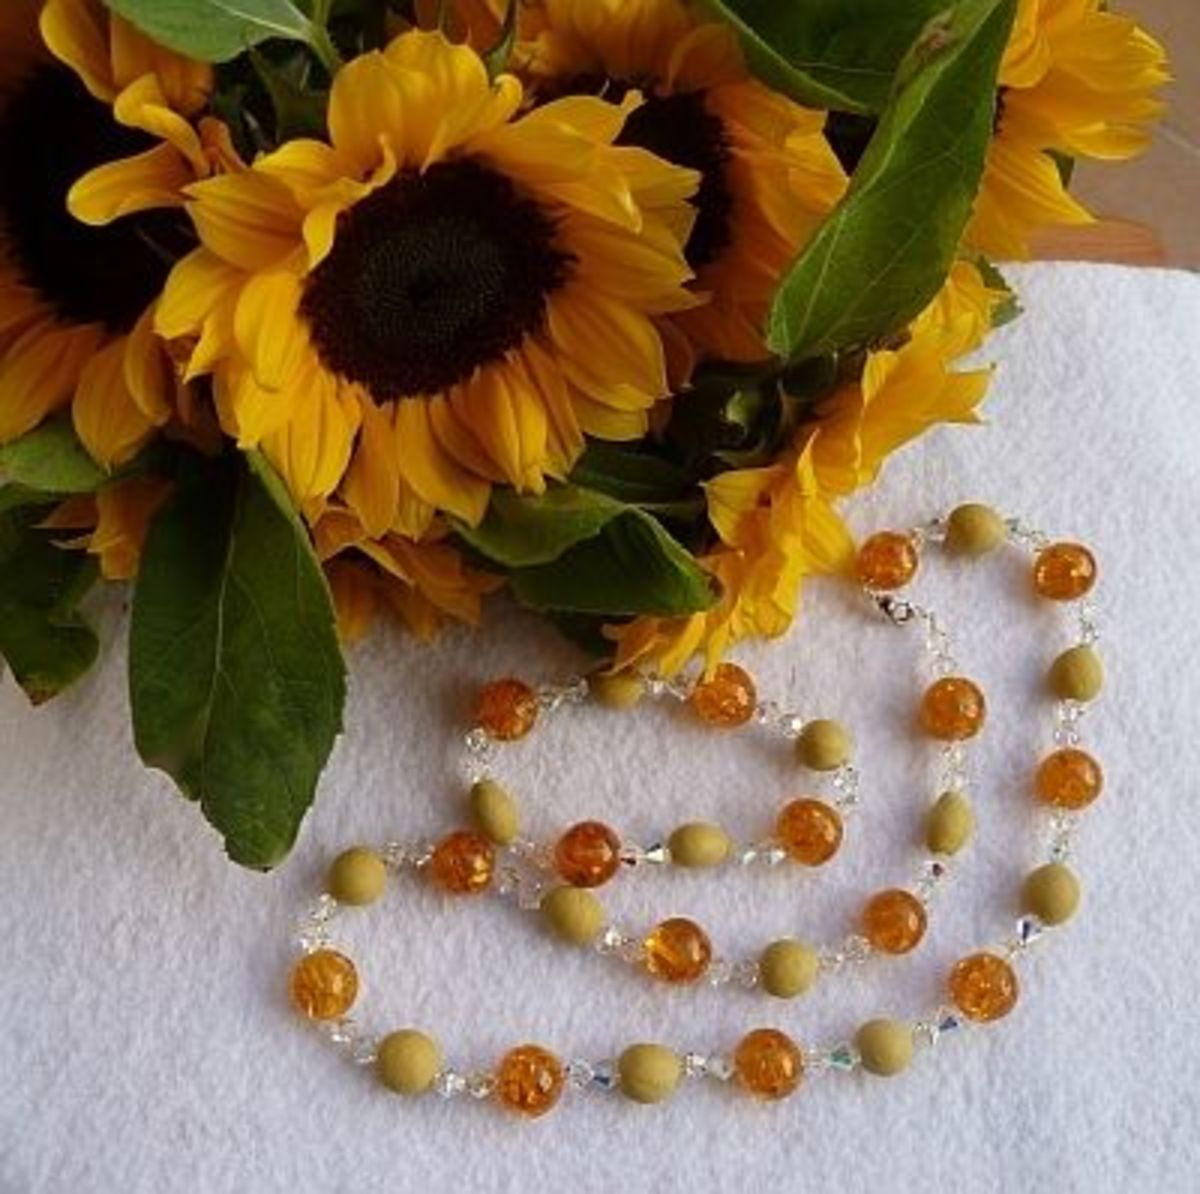 Sunflower necklace.